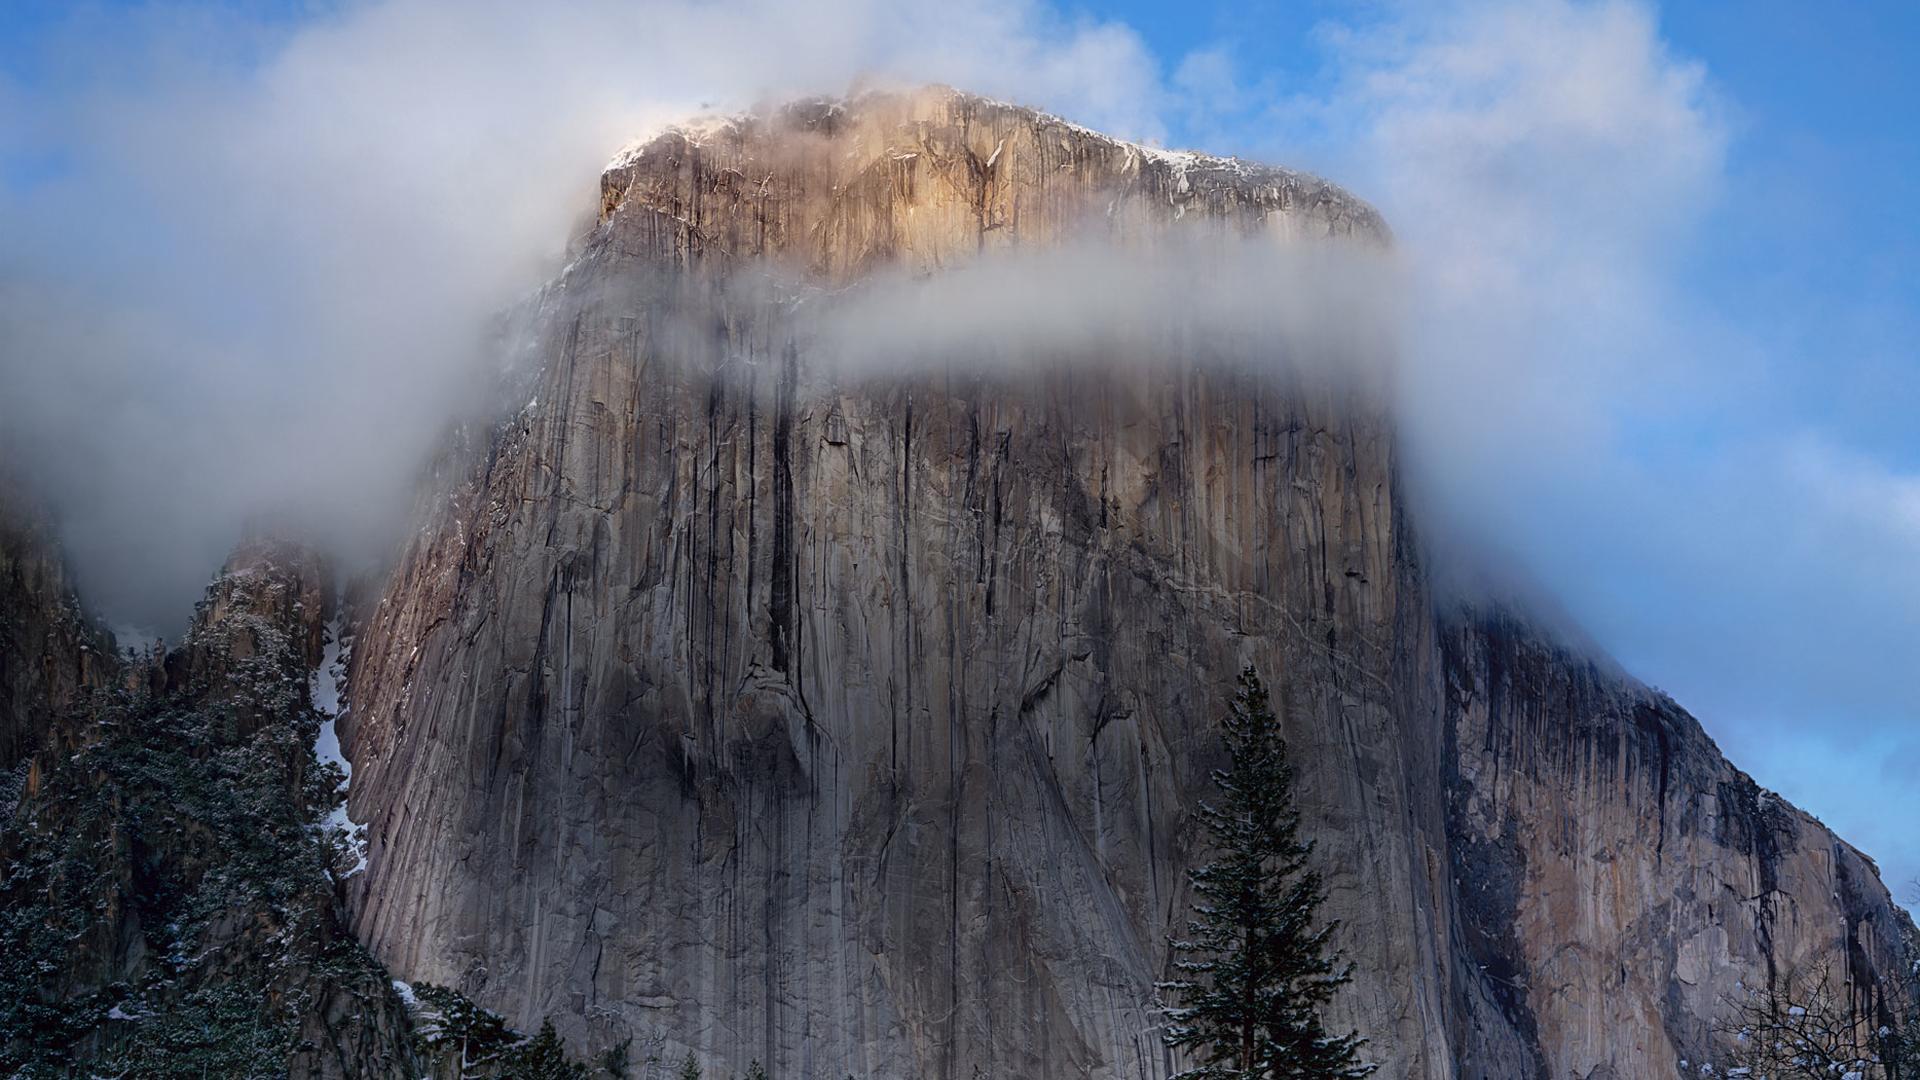 Yosemite wallpaper os x fonds d 39 cran jcbtechno for Photo ecran osx